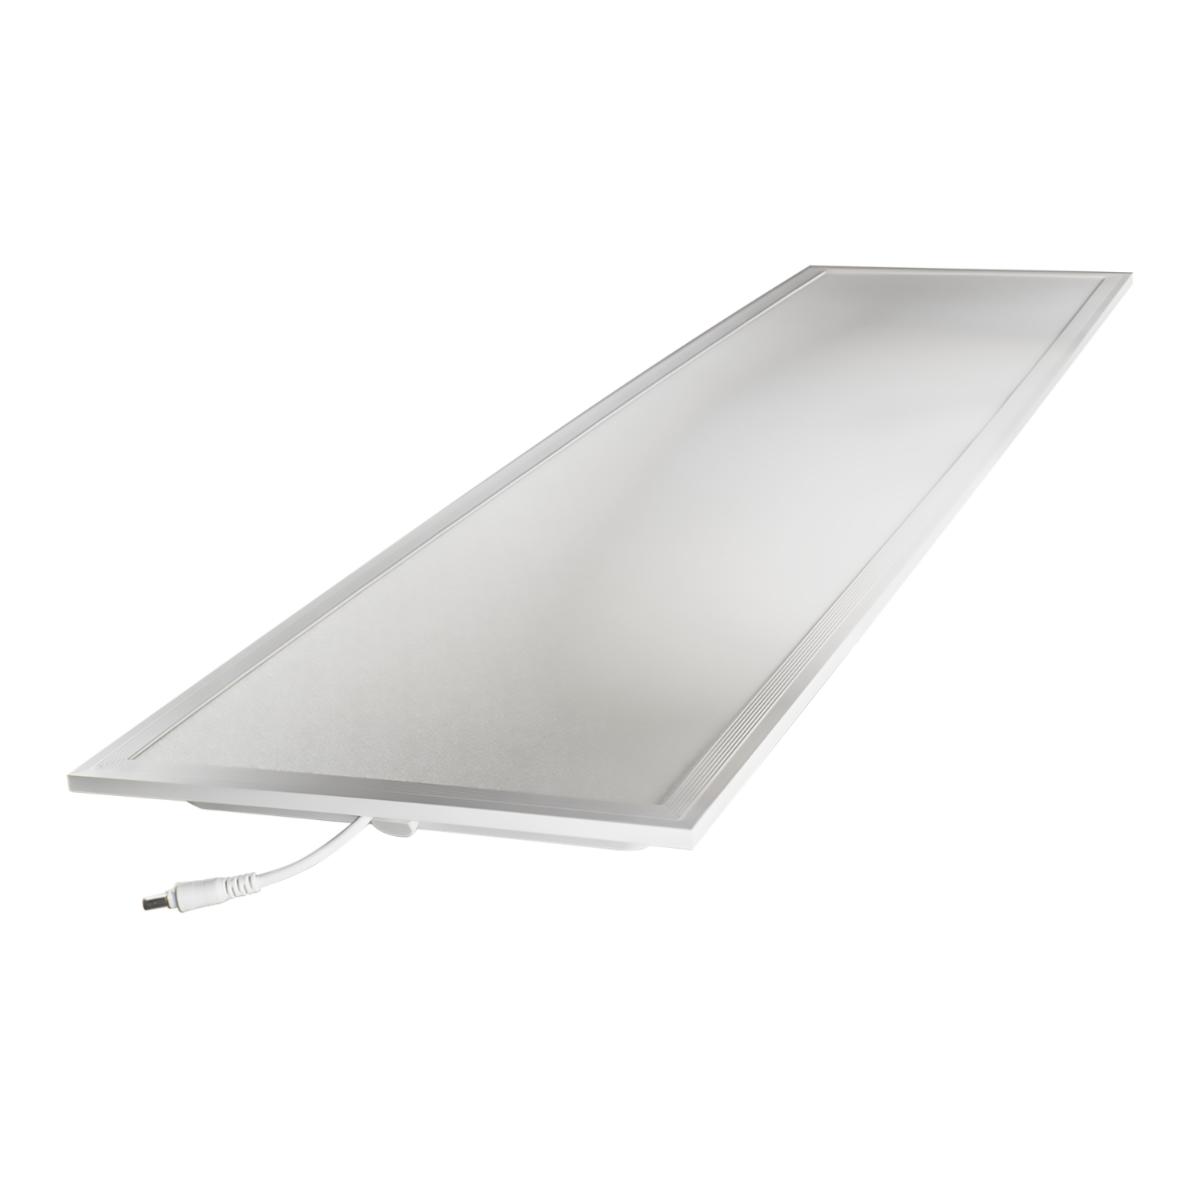 Noxion LED Paneel Econox 32W 30x120cm 3000K 3900lm UGR <22 | Warm Wit - Vervangt 2x36W